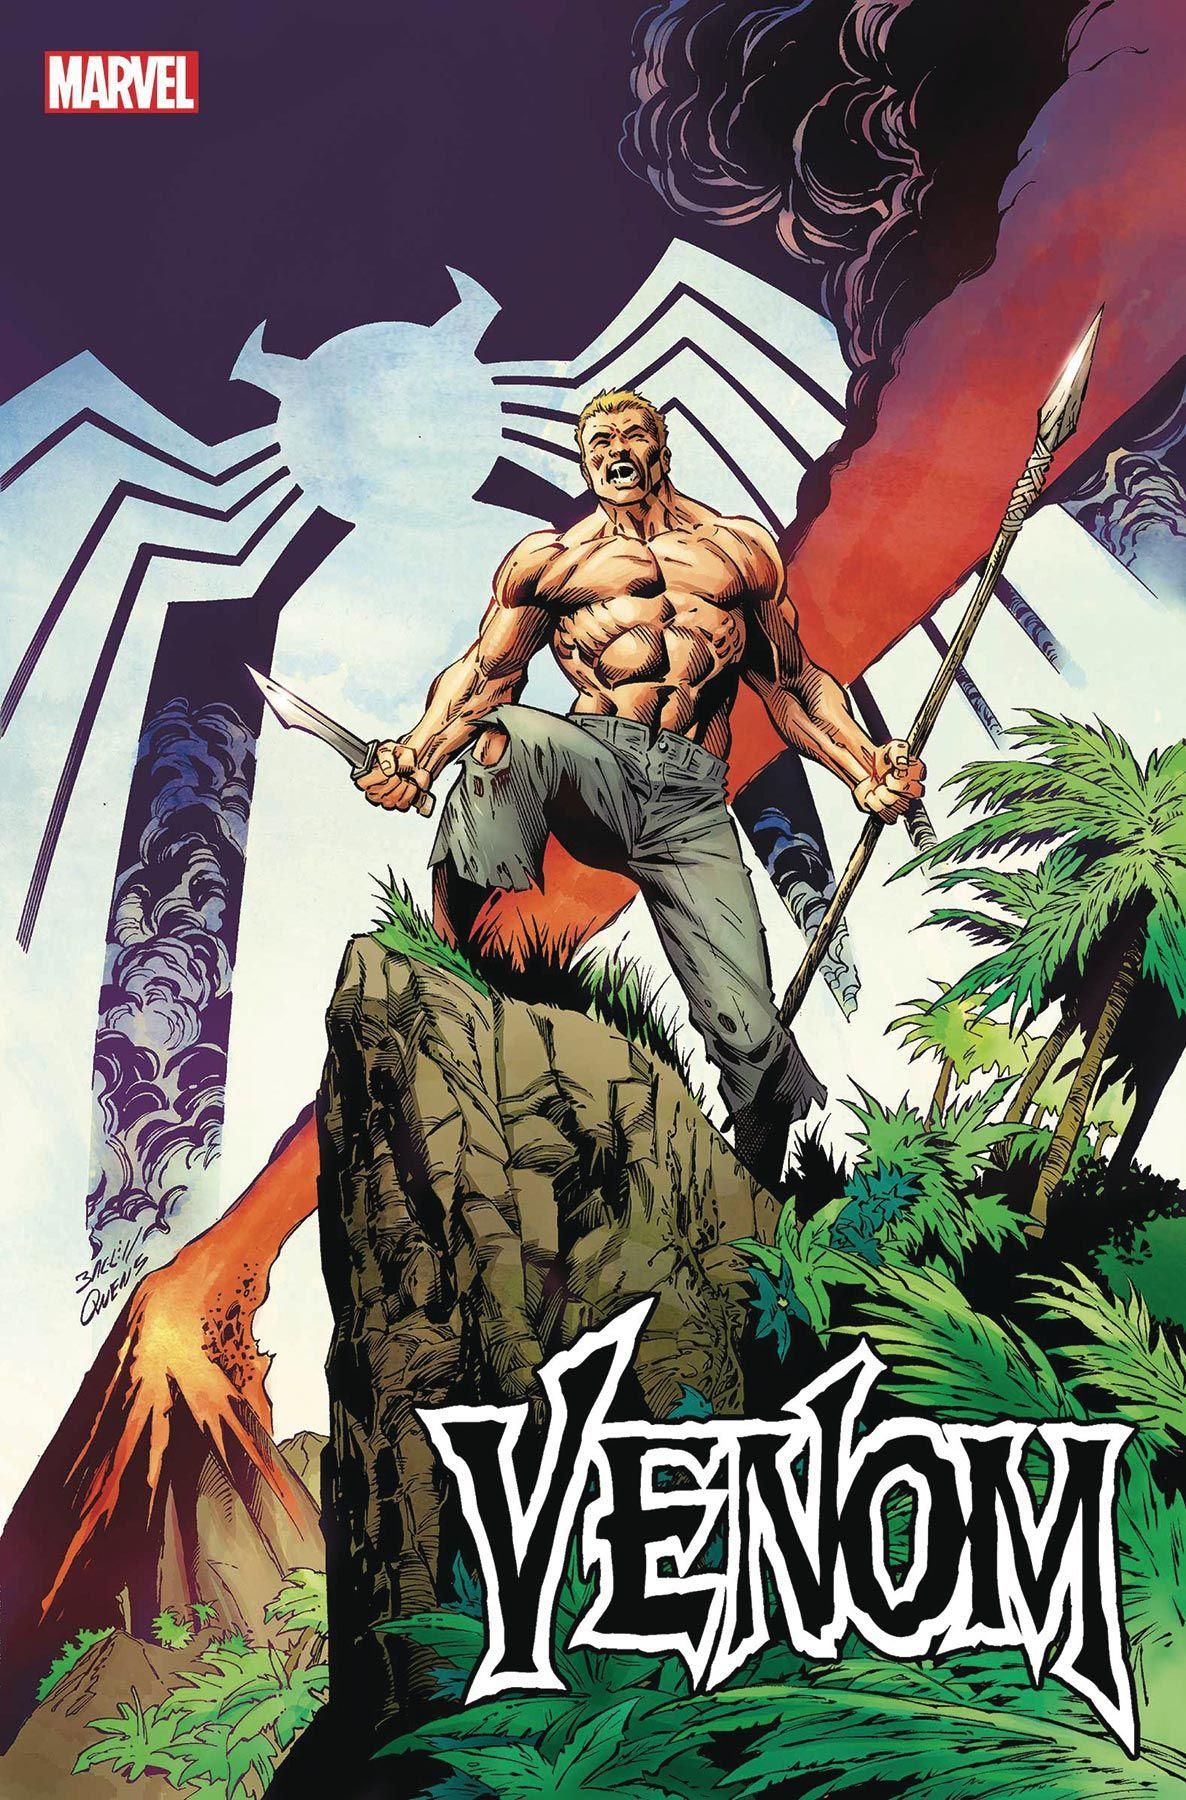 Review: Venom #21 Takes the Antihero Back to the Bloody Basics